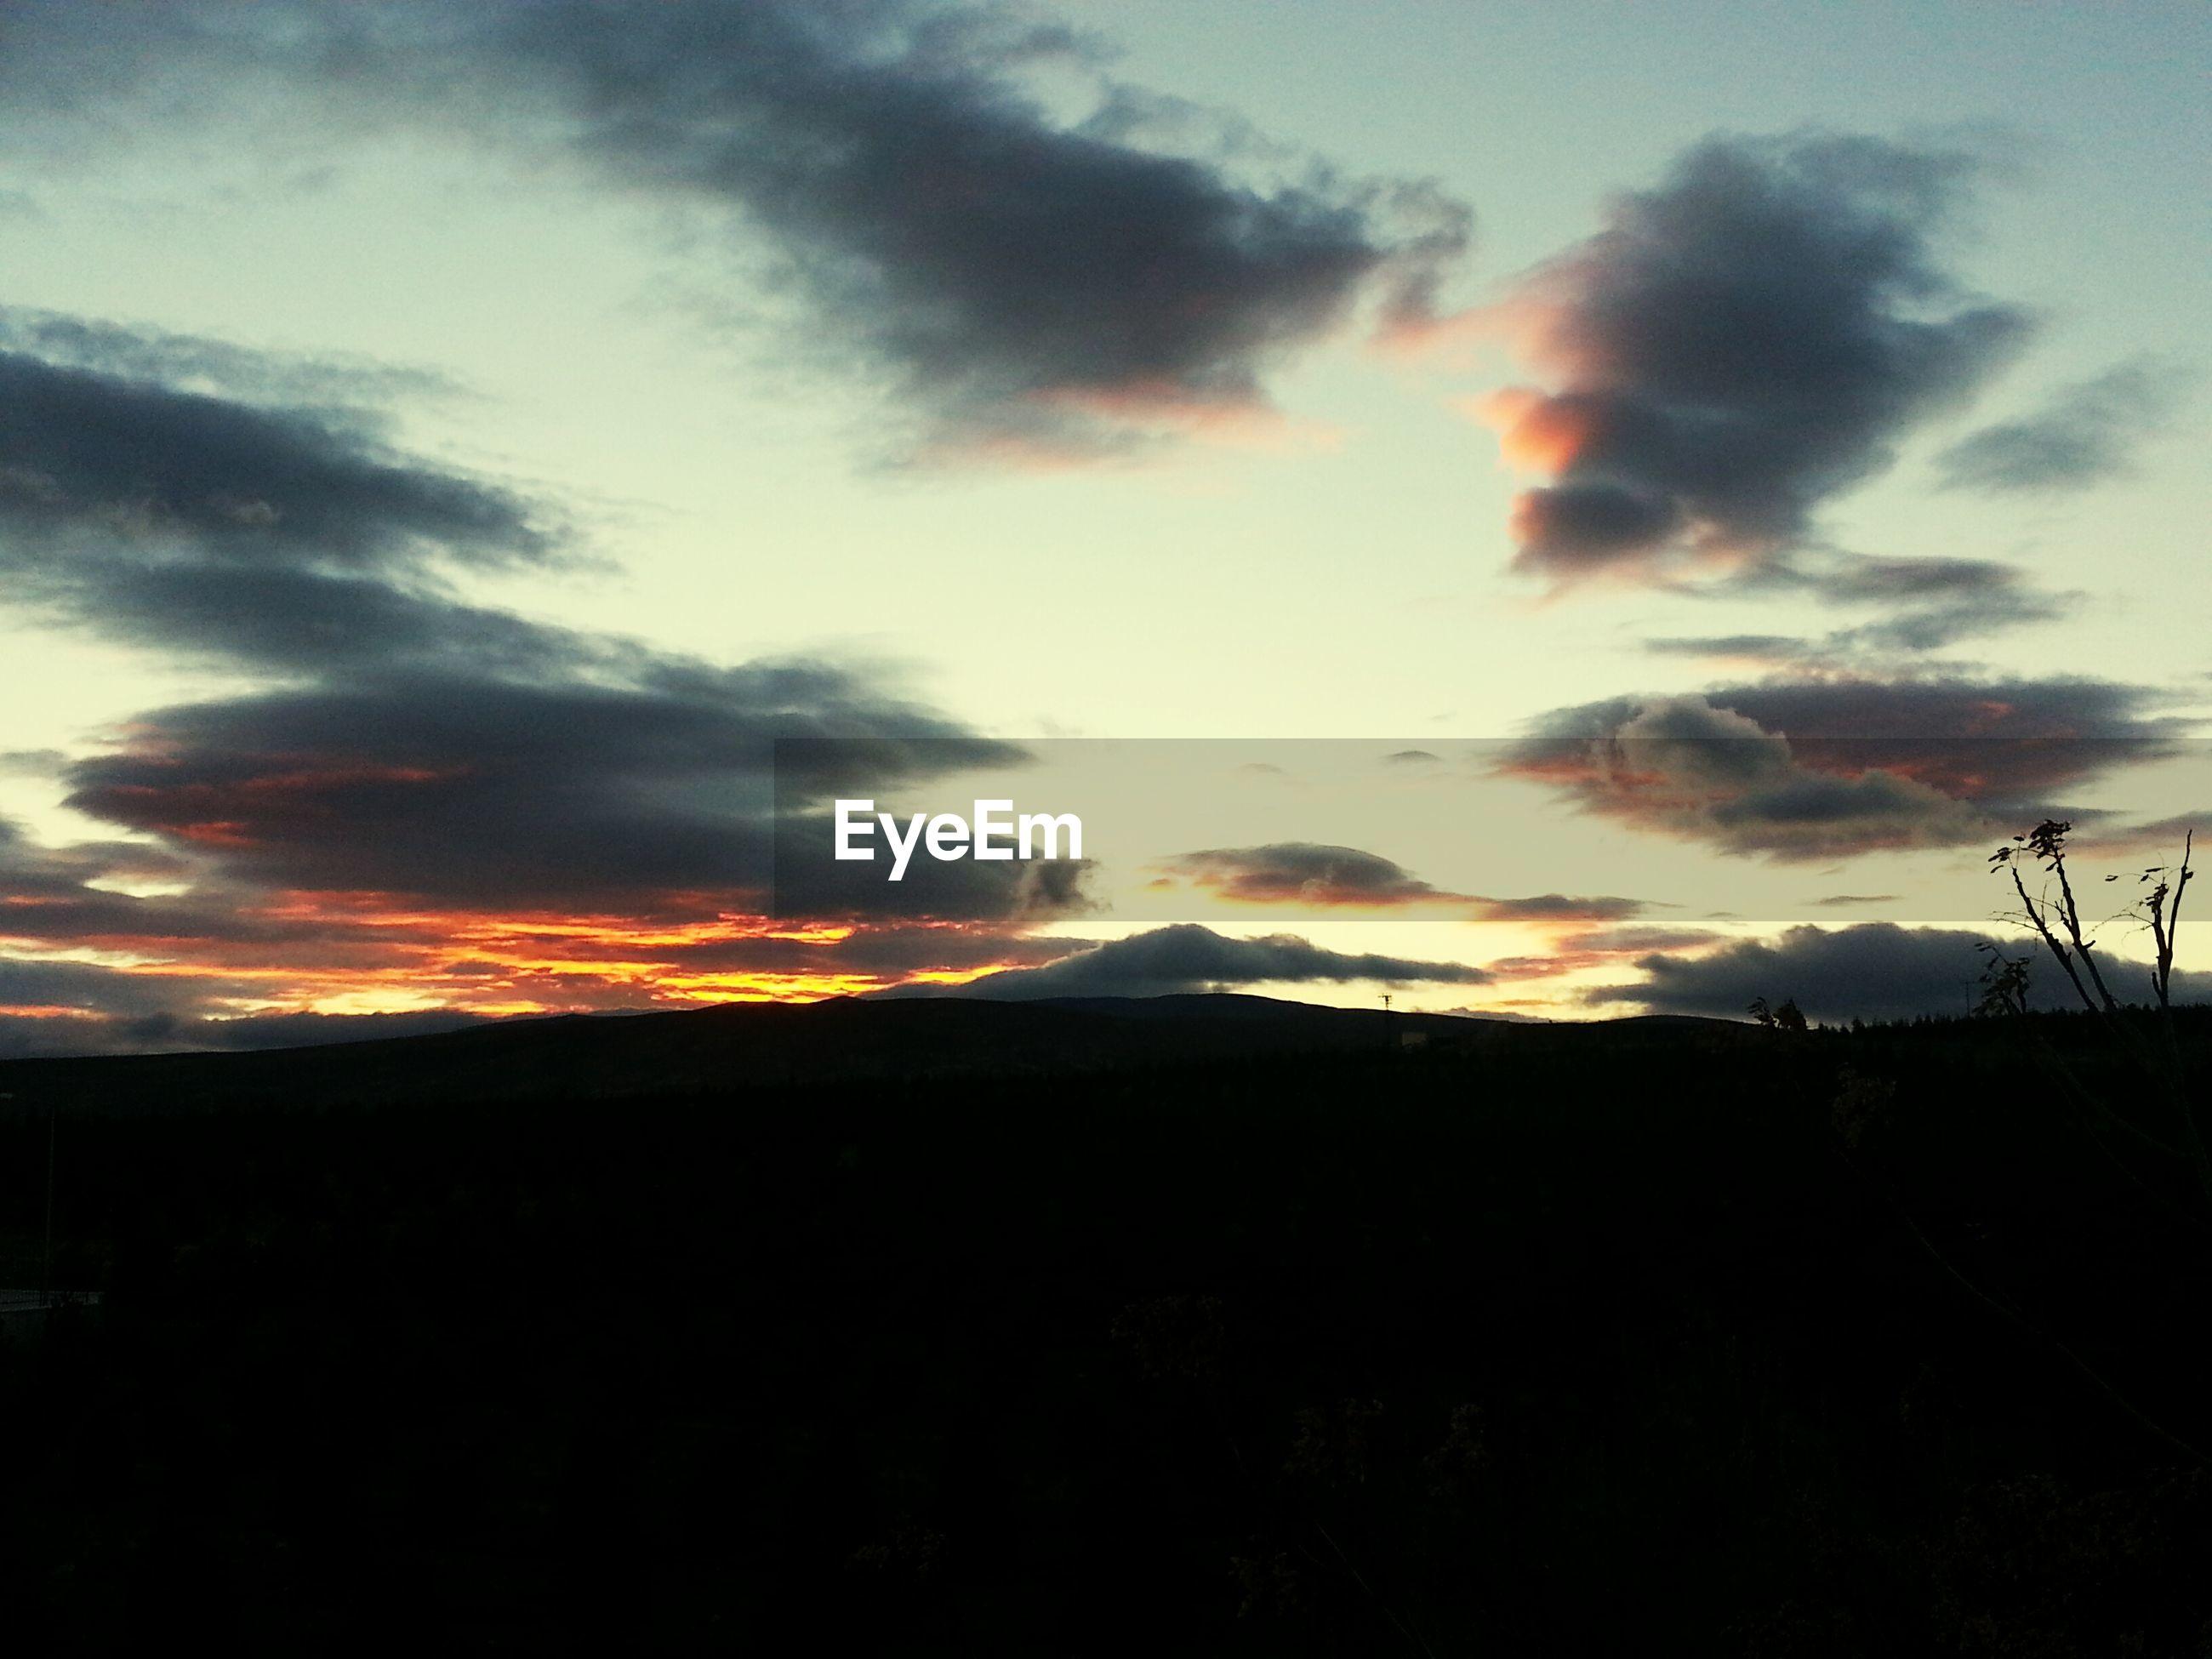 sunset, silhouette, sky, tranquil scene, tranquility, scenics, landscape, beauty in nature, cloud - sky, nature, idyllic, orange color, cloud, cloudy, field, dark, dramatic sky, horizon over land, non-urban scene, dusk